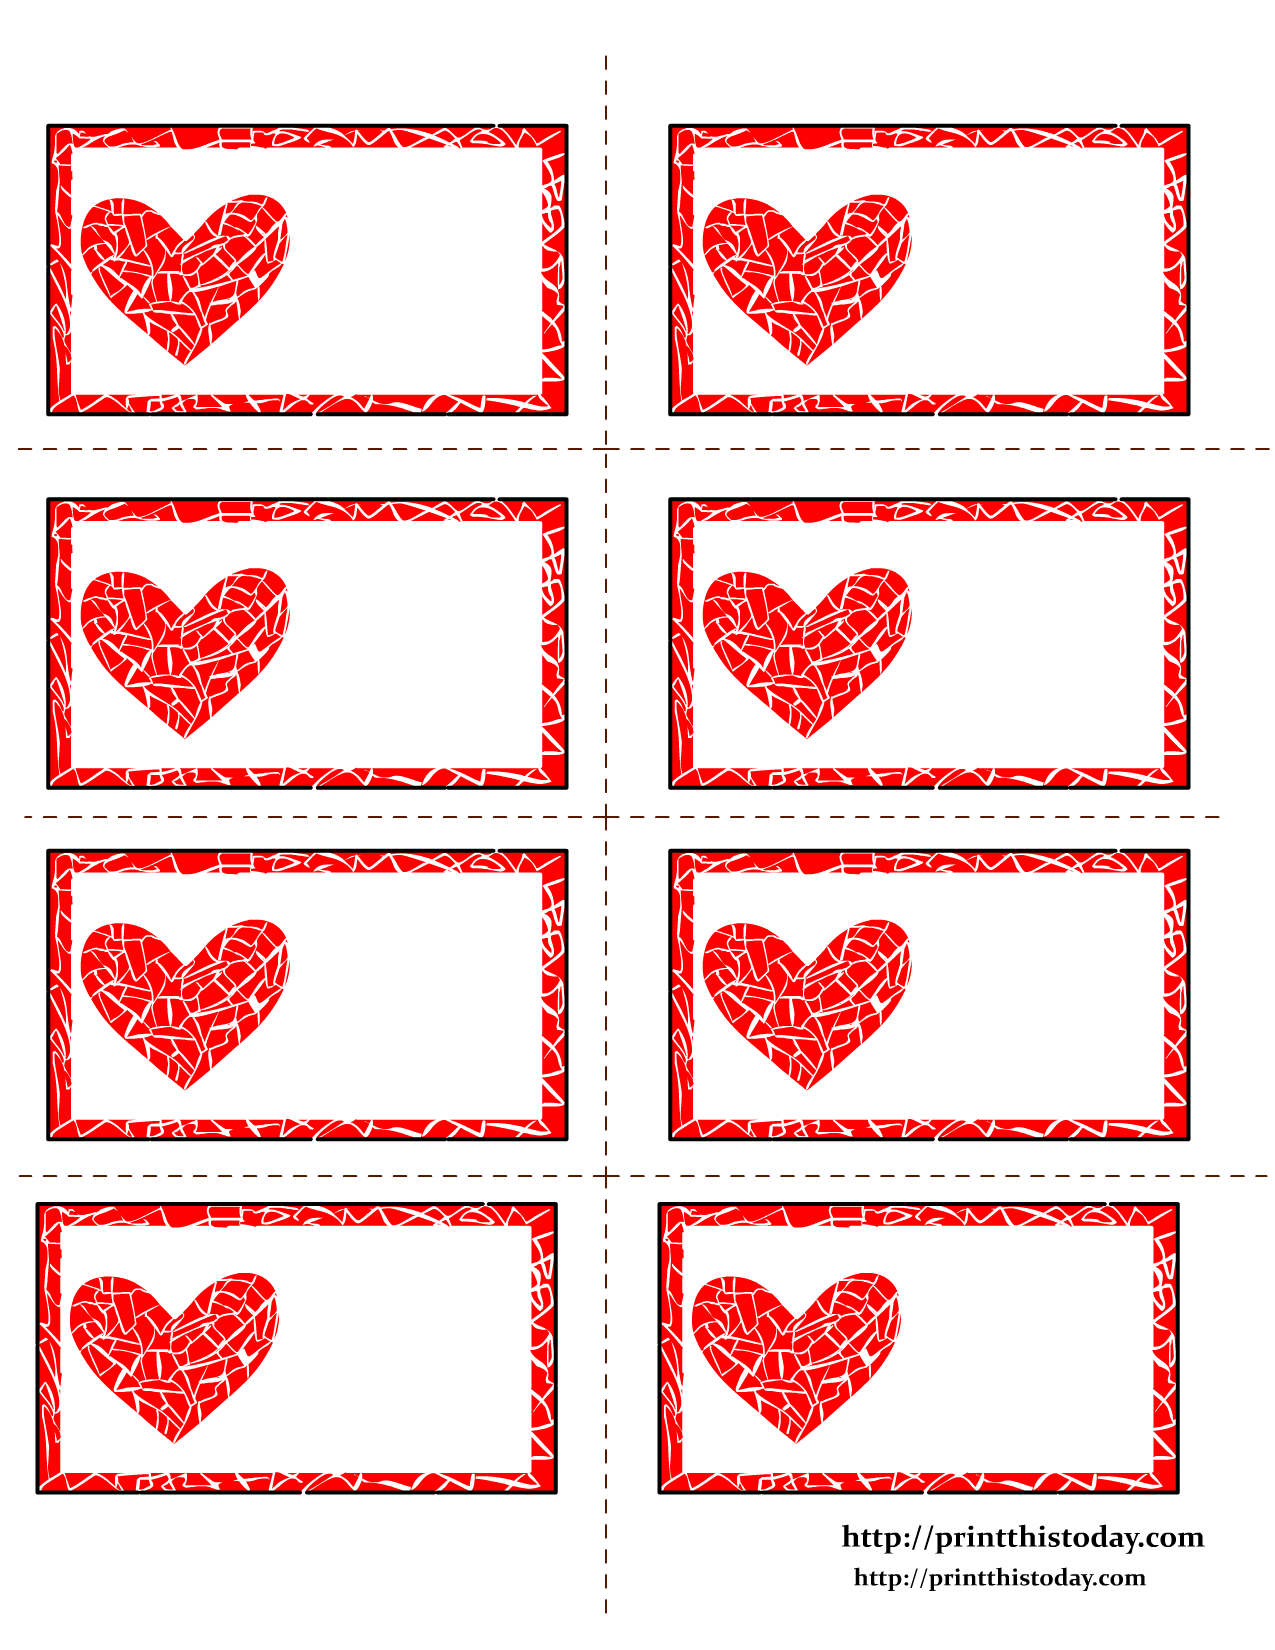 Free Printable Hearts Labels - Free Printable Hearts